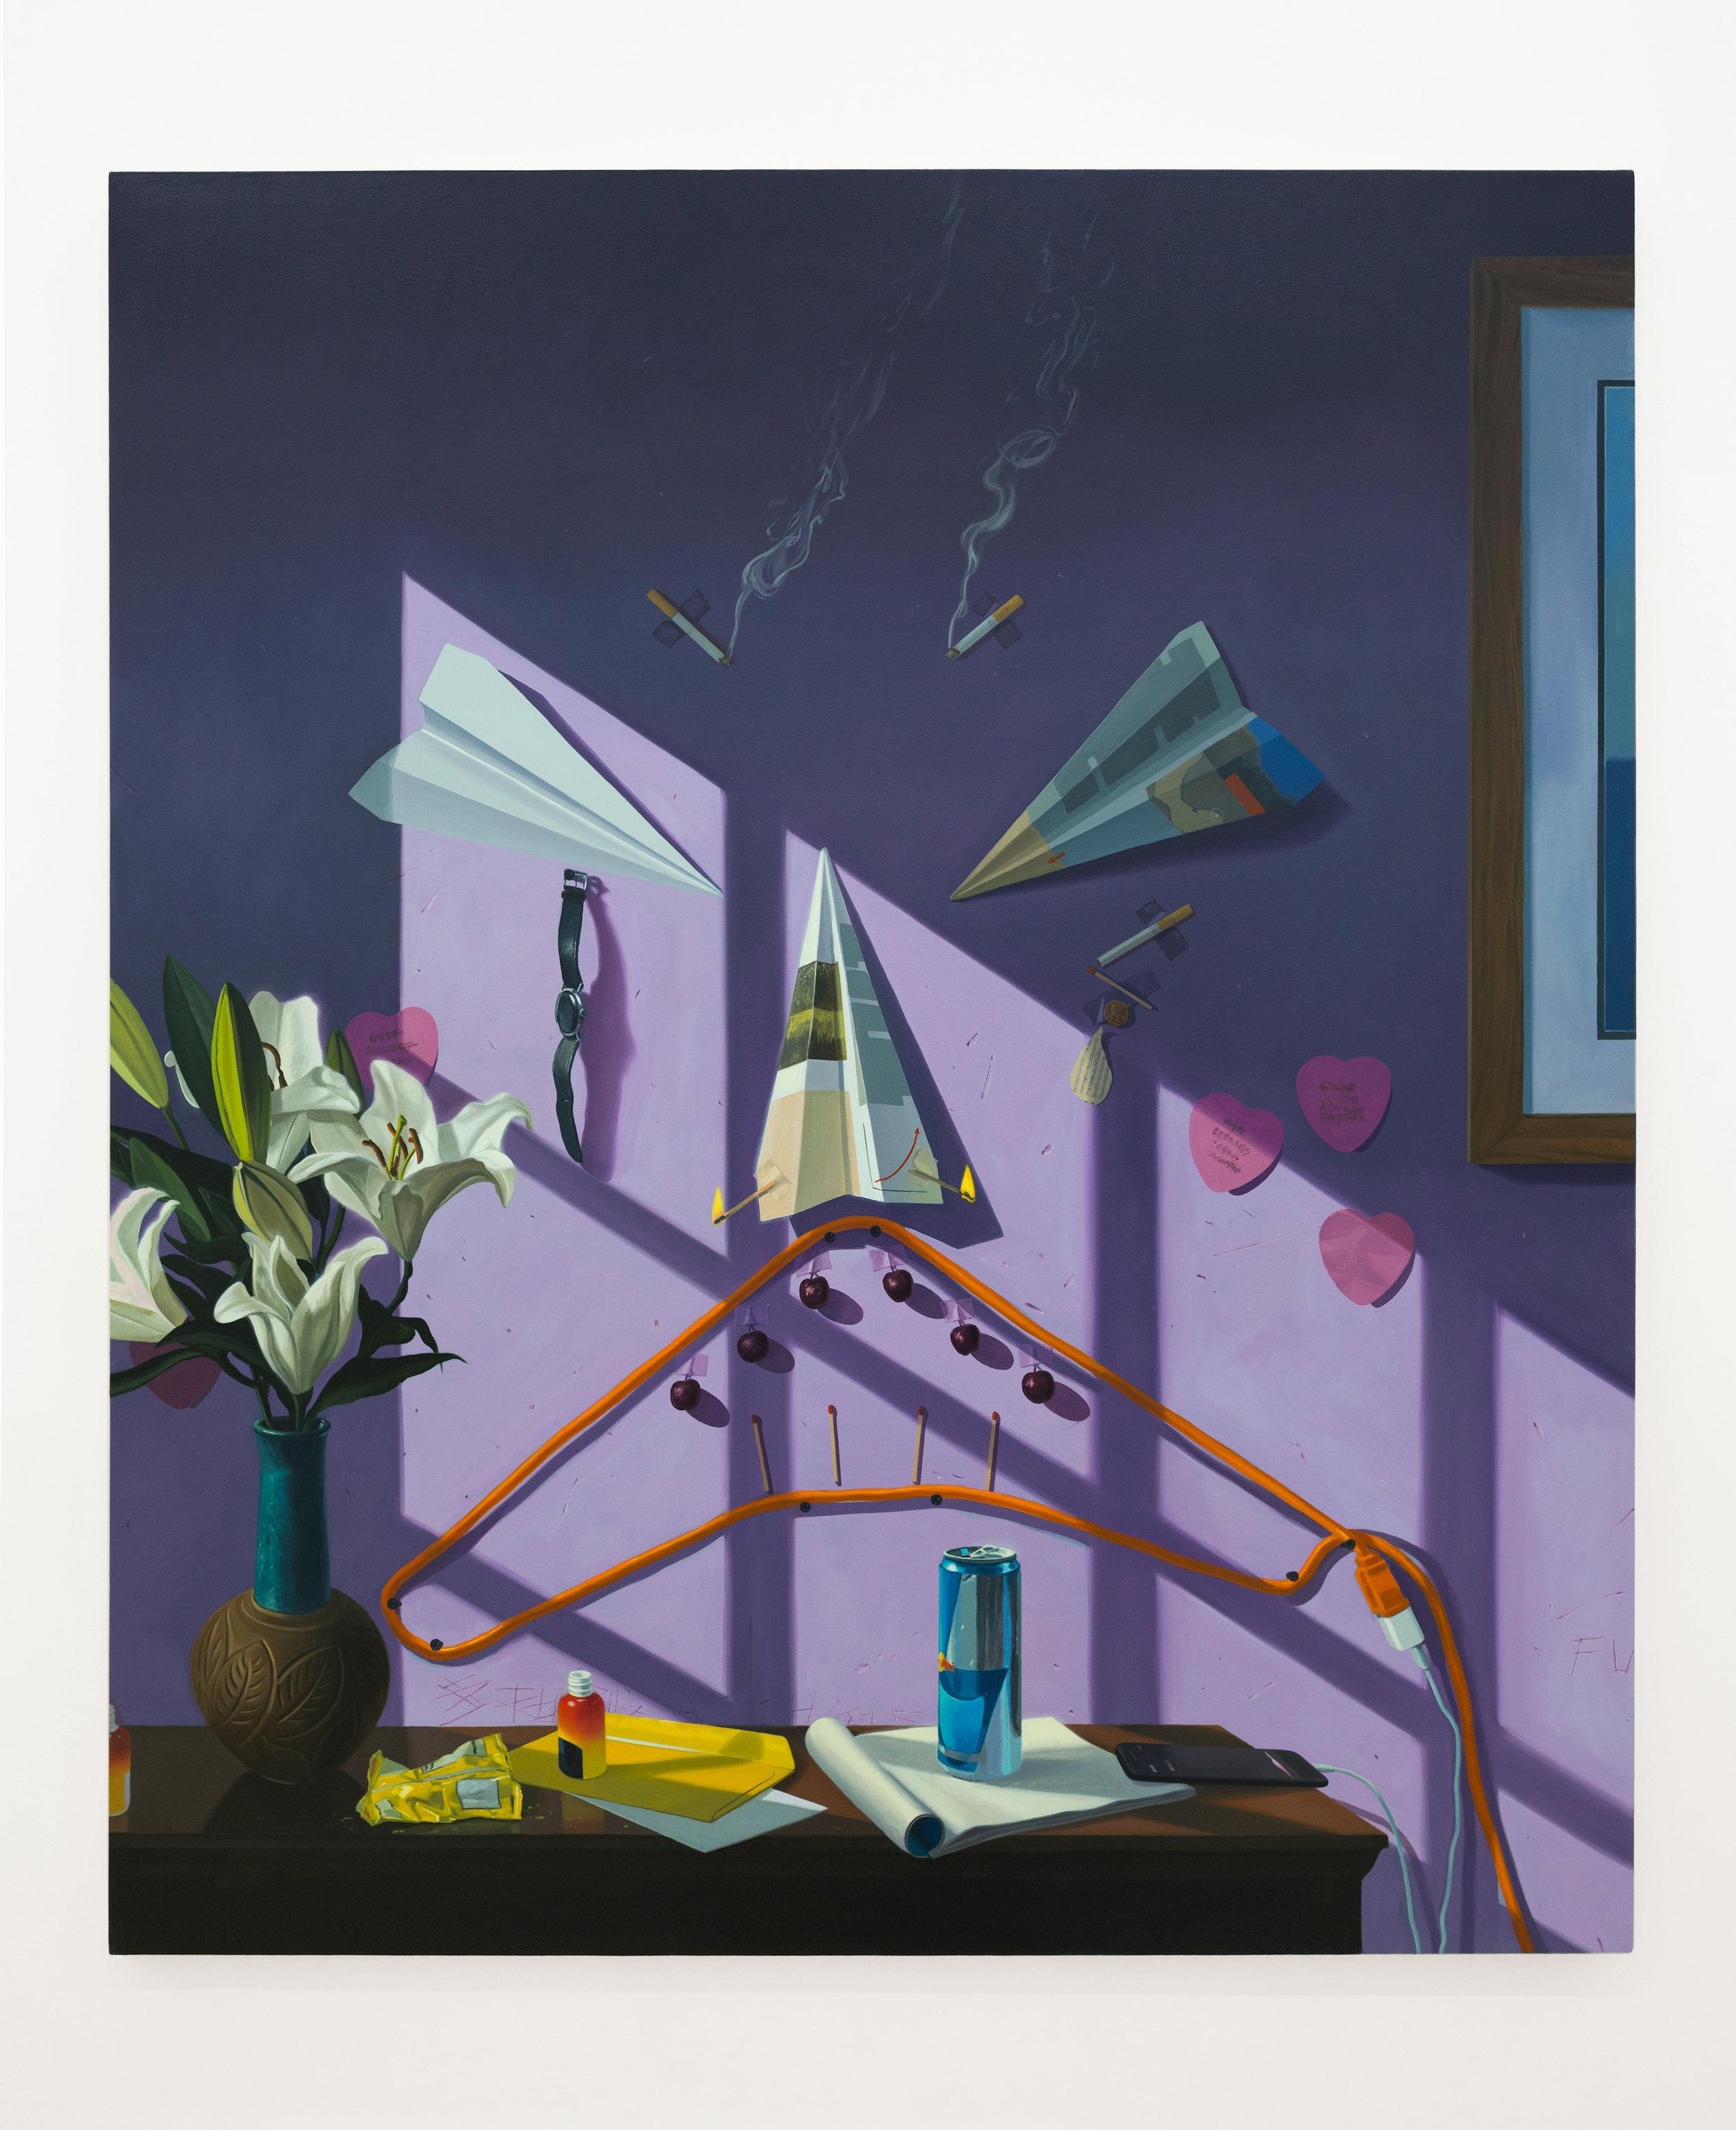 Rouphail_Lavender_Room.jpg